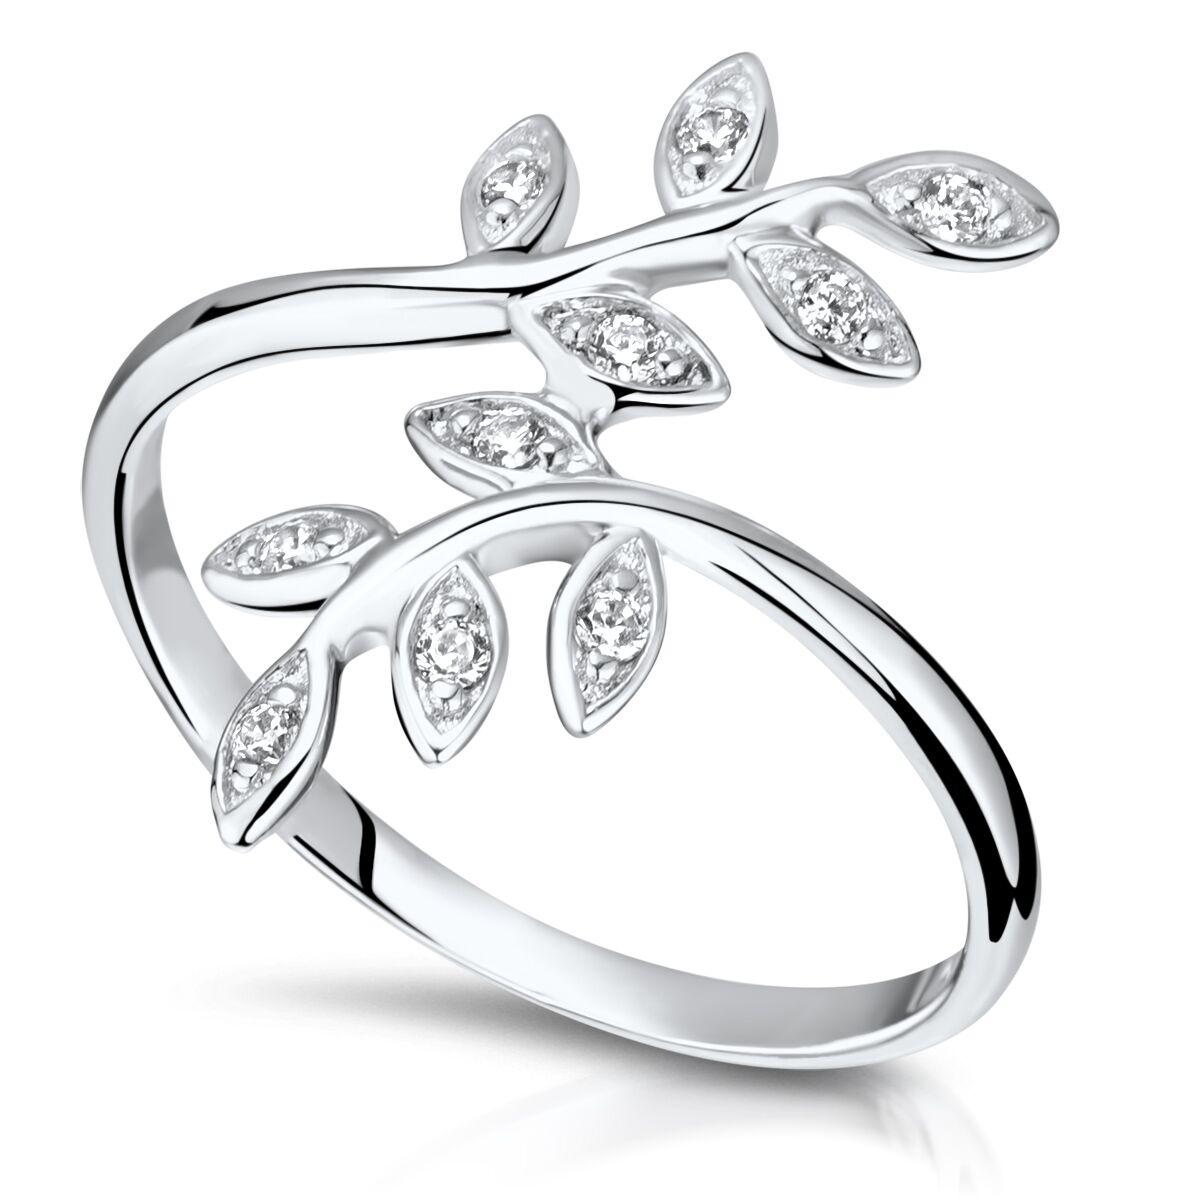 Blätter Ringe 925 Silber Versilbert Ringe Damen Modisch verstellbar  Lorbeer